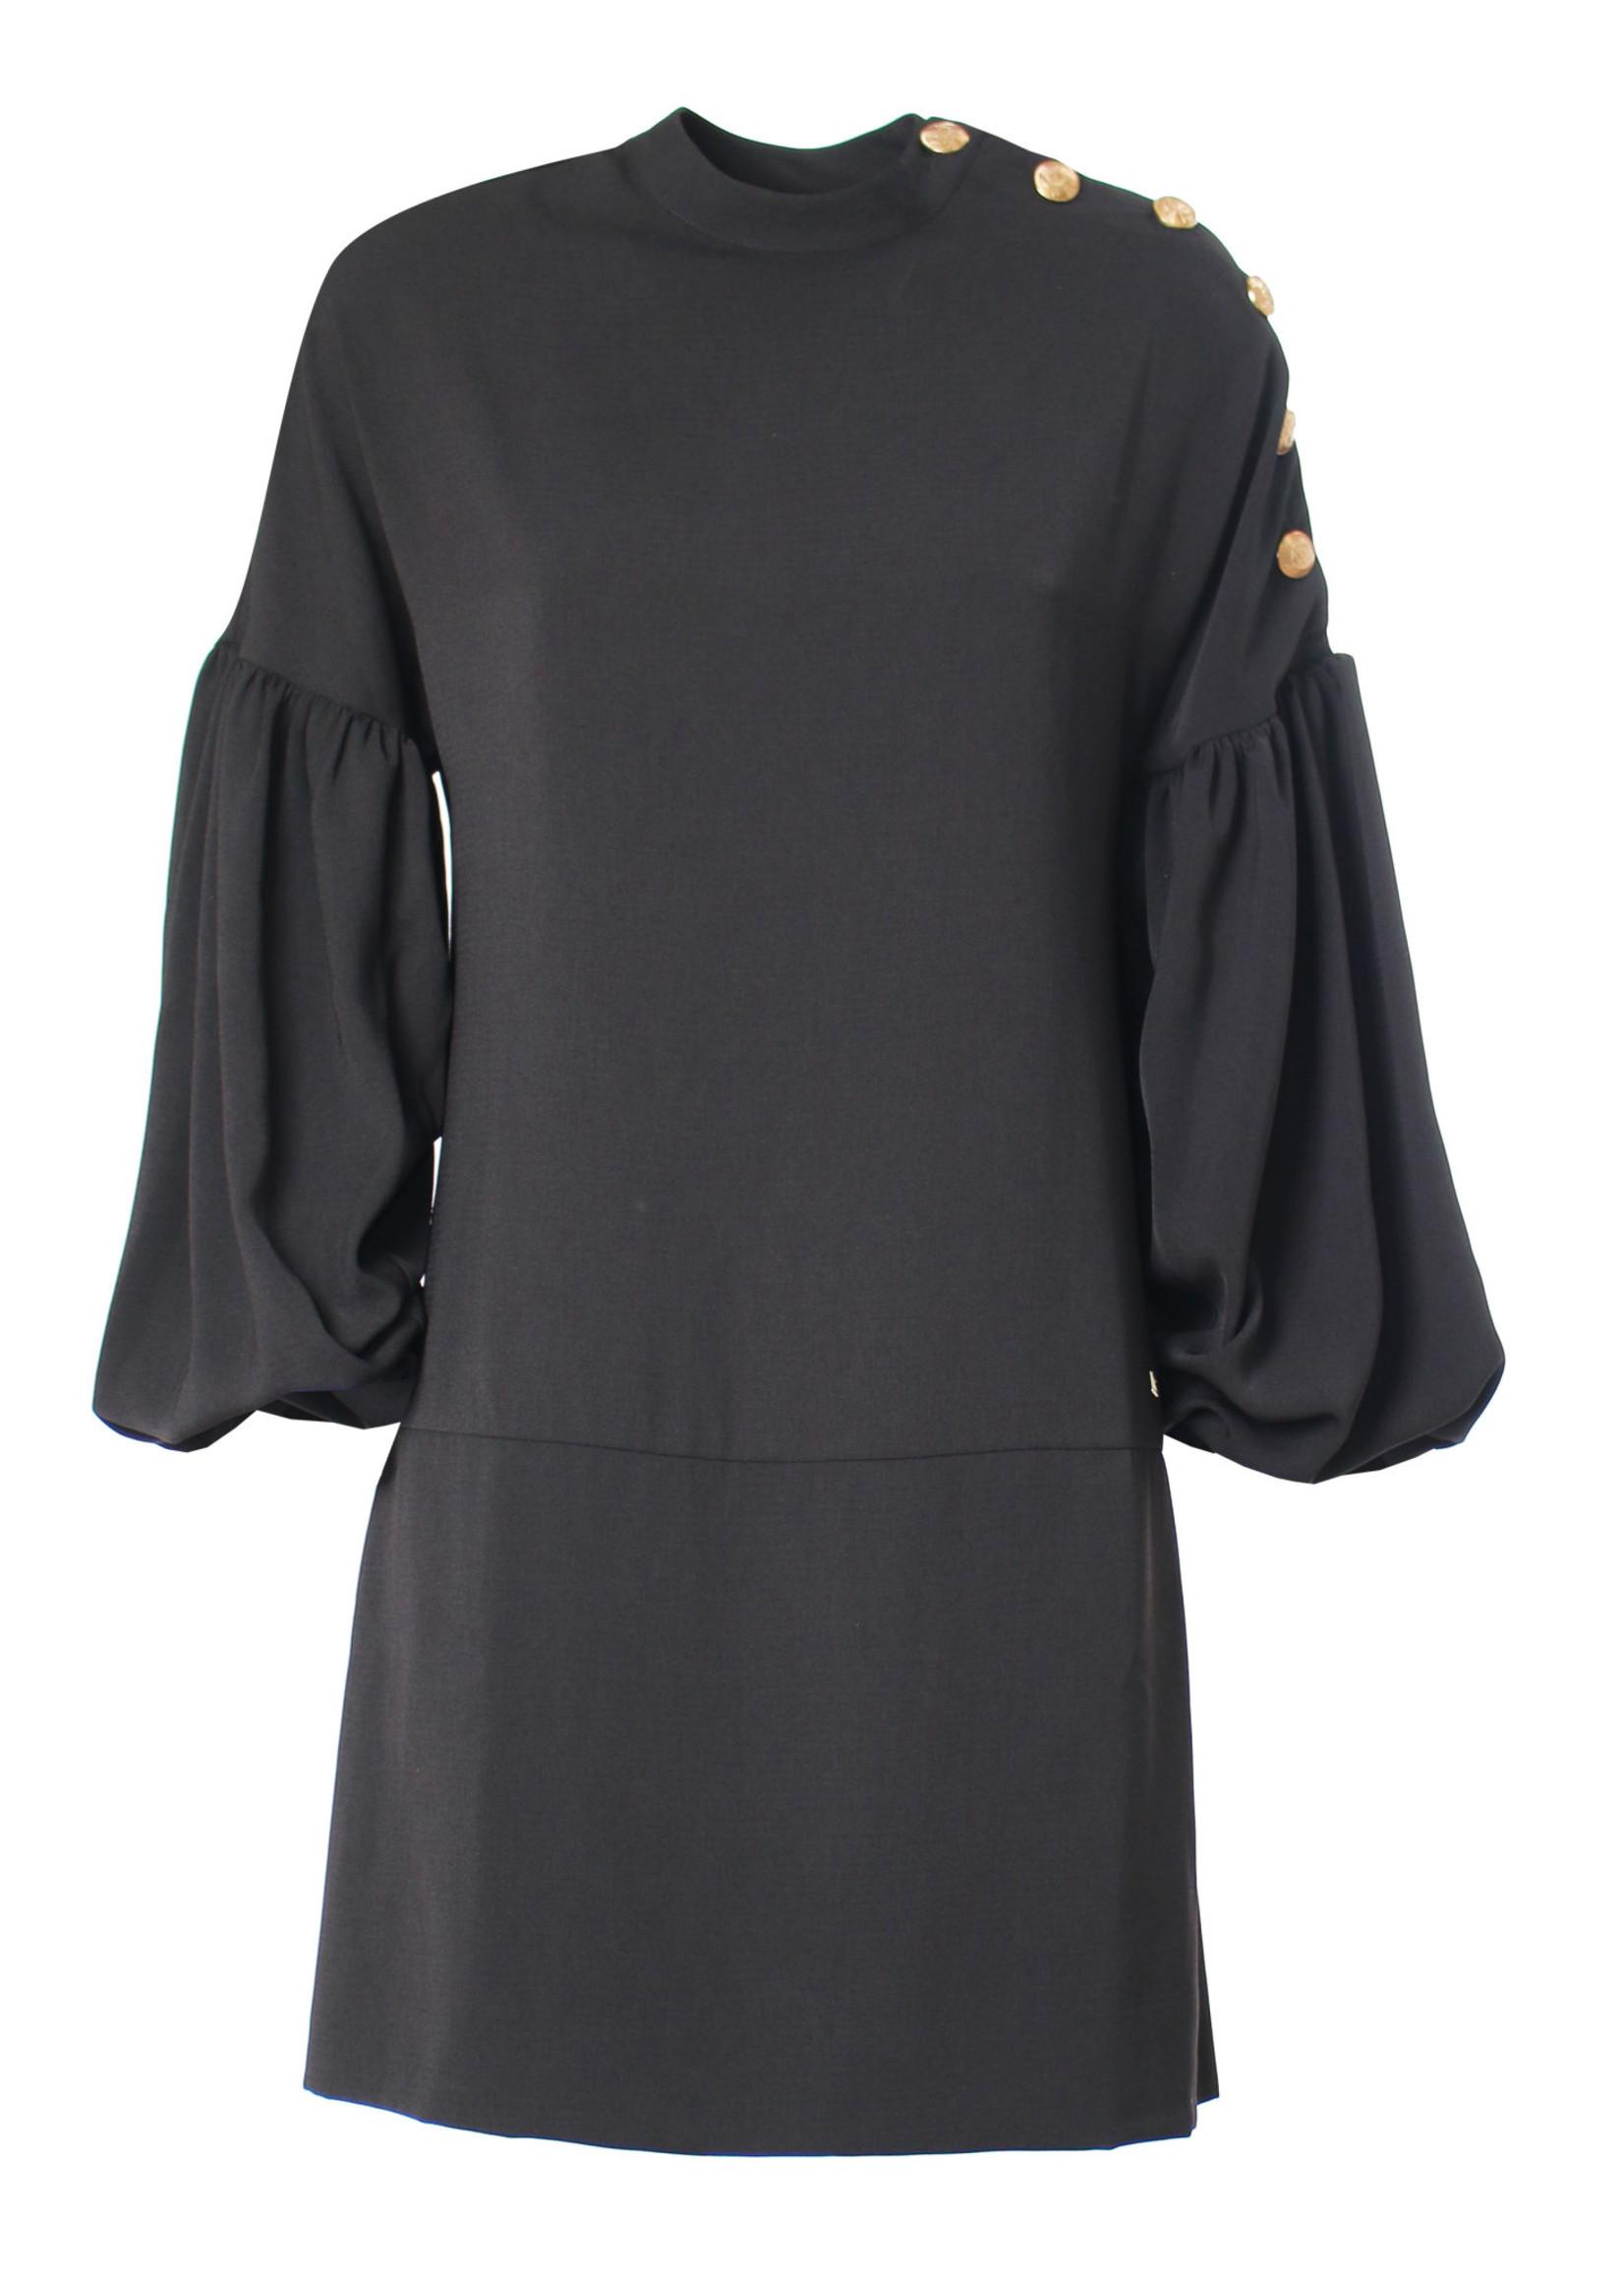 Kocca LYNN DRESS Black